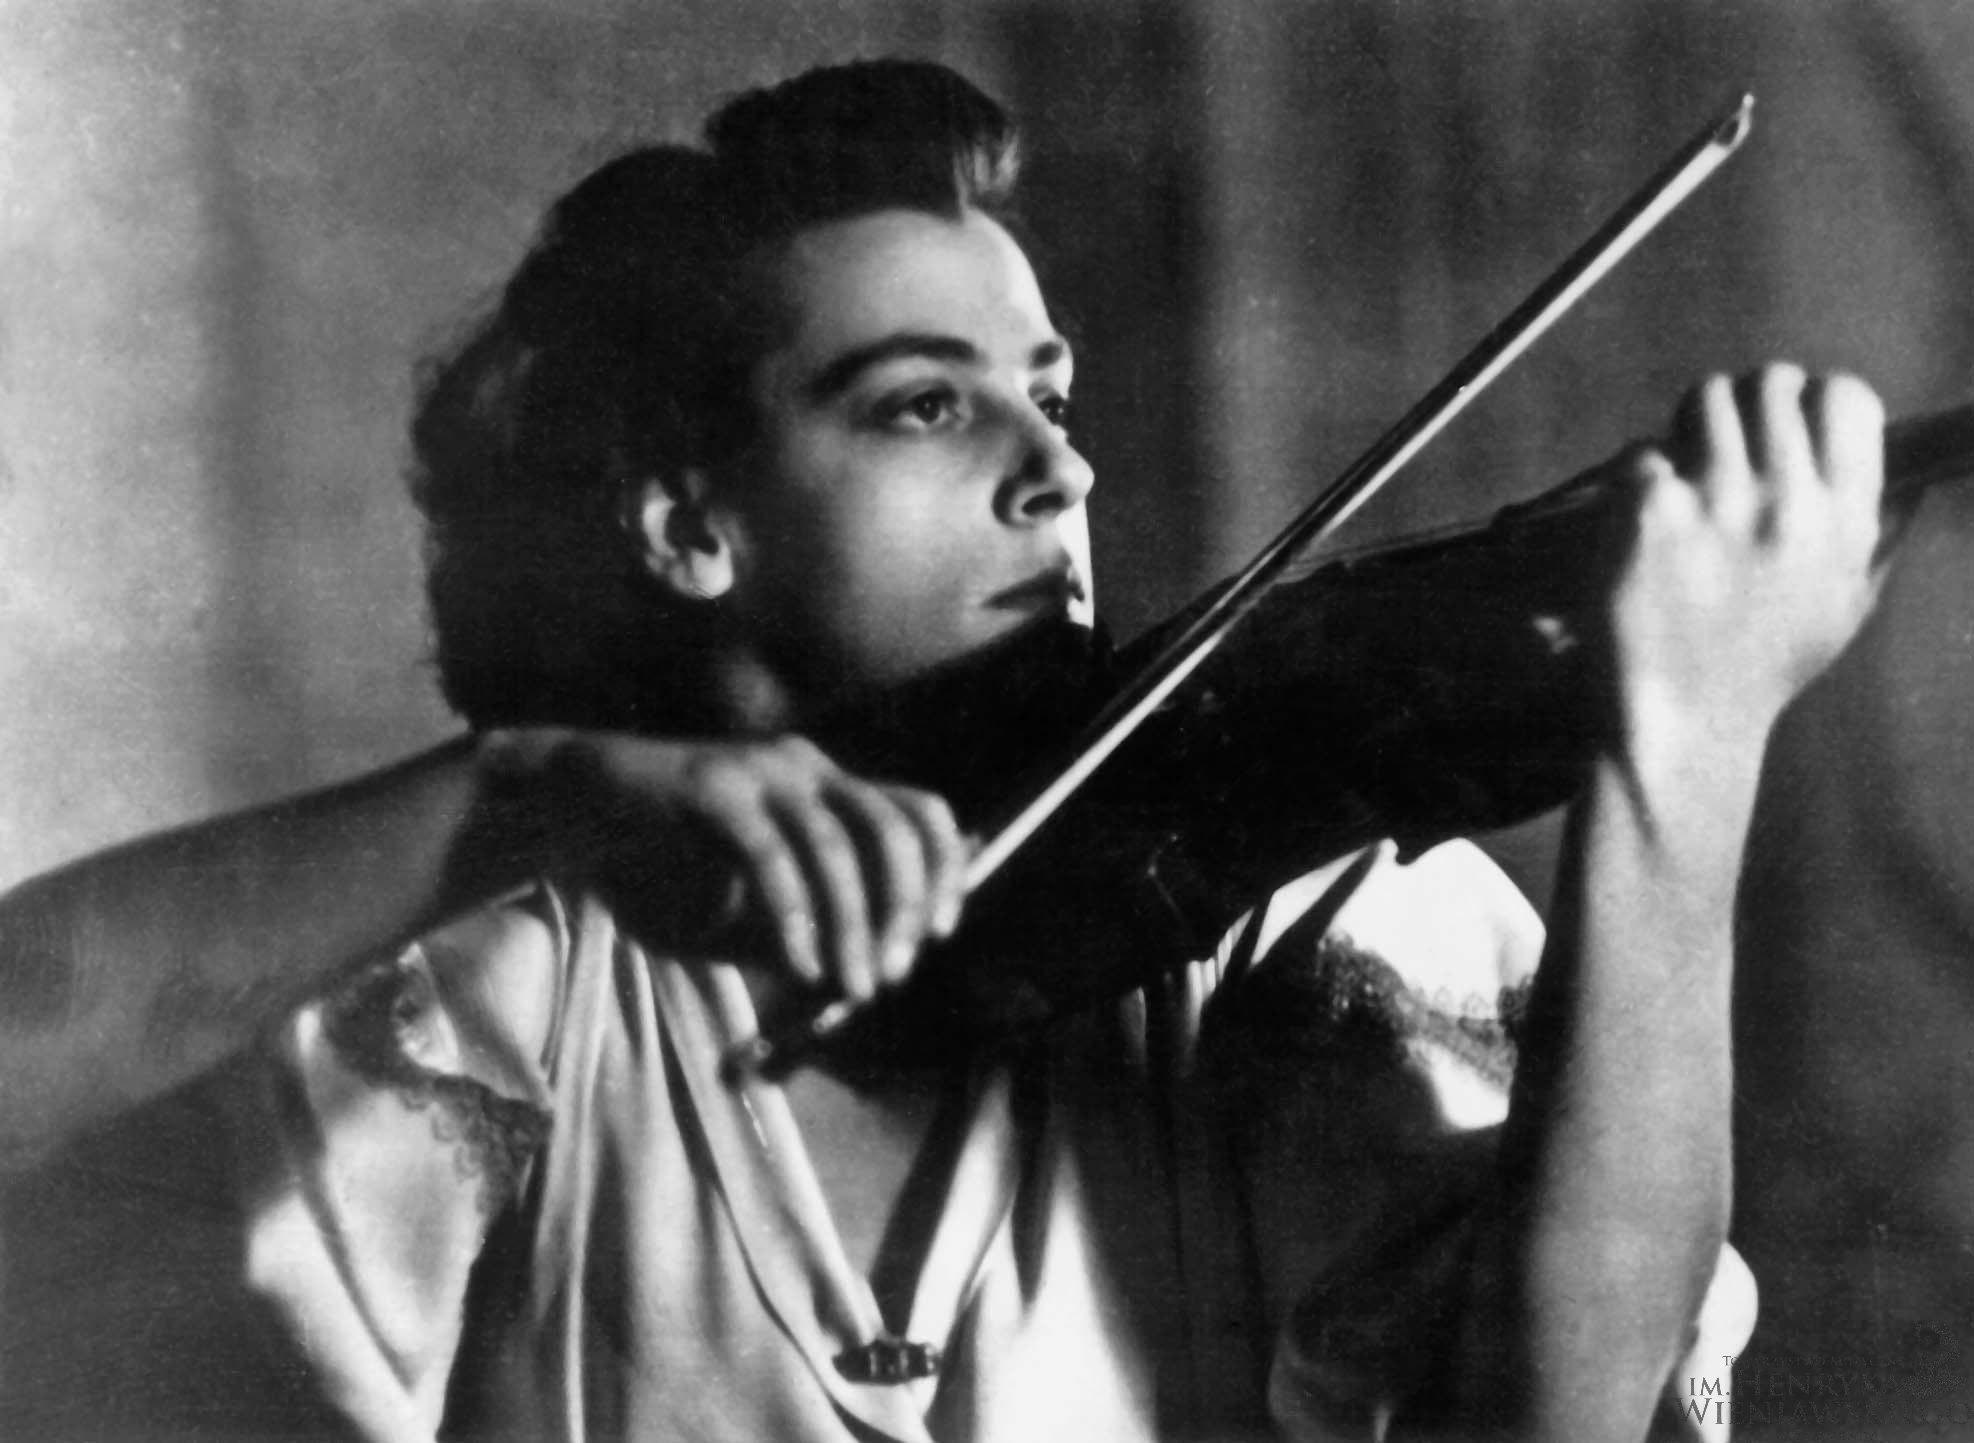 Chronicle: International Henryk Wieniawski Violin Competition (1935-2011)